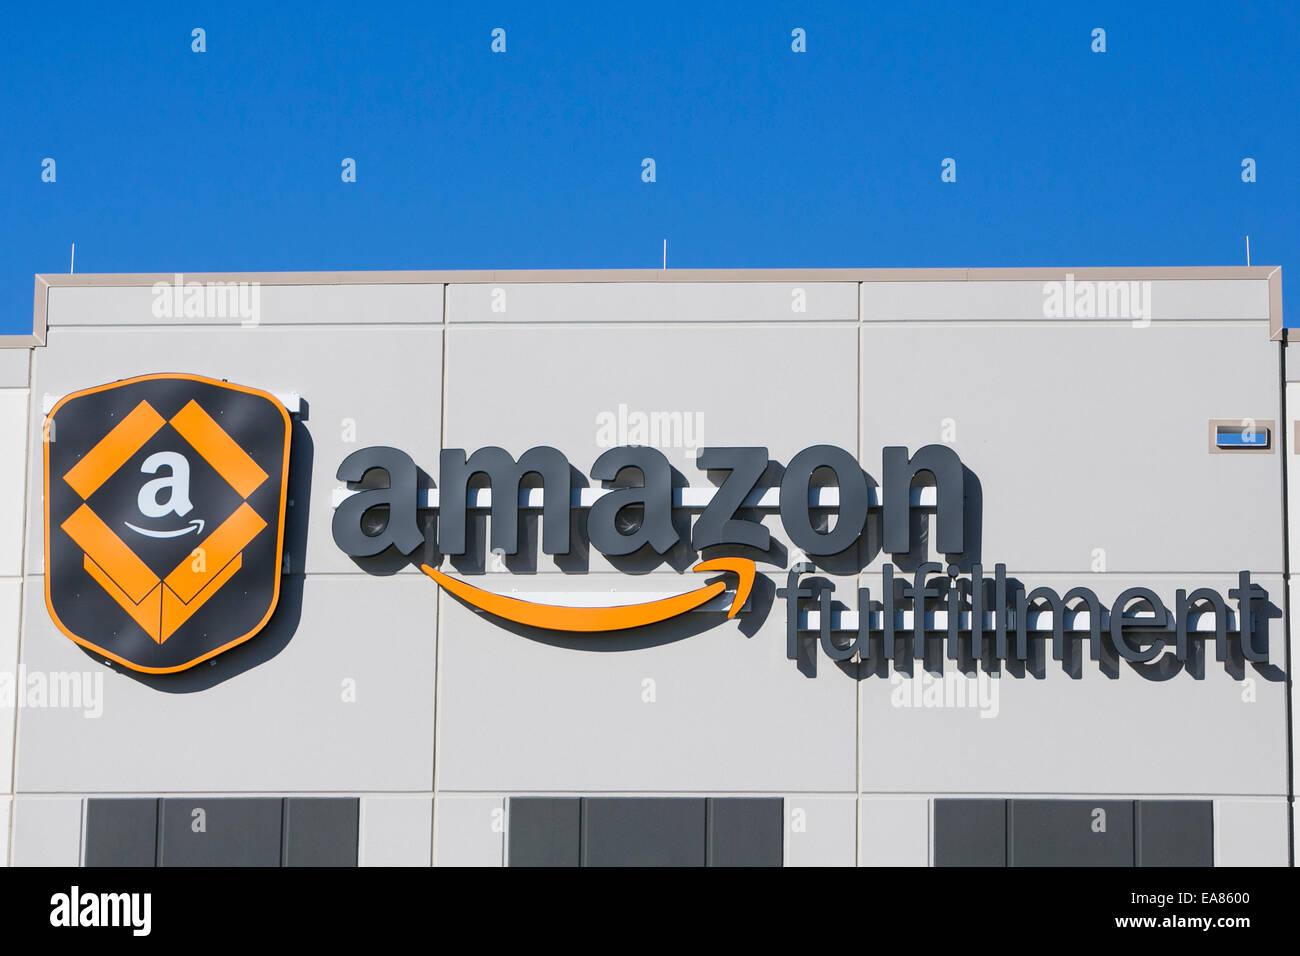 An Amazon.com Fulfillment center in Chester, Virginia. - Stock Image